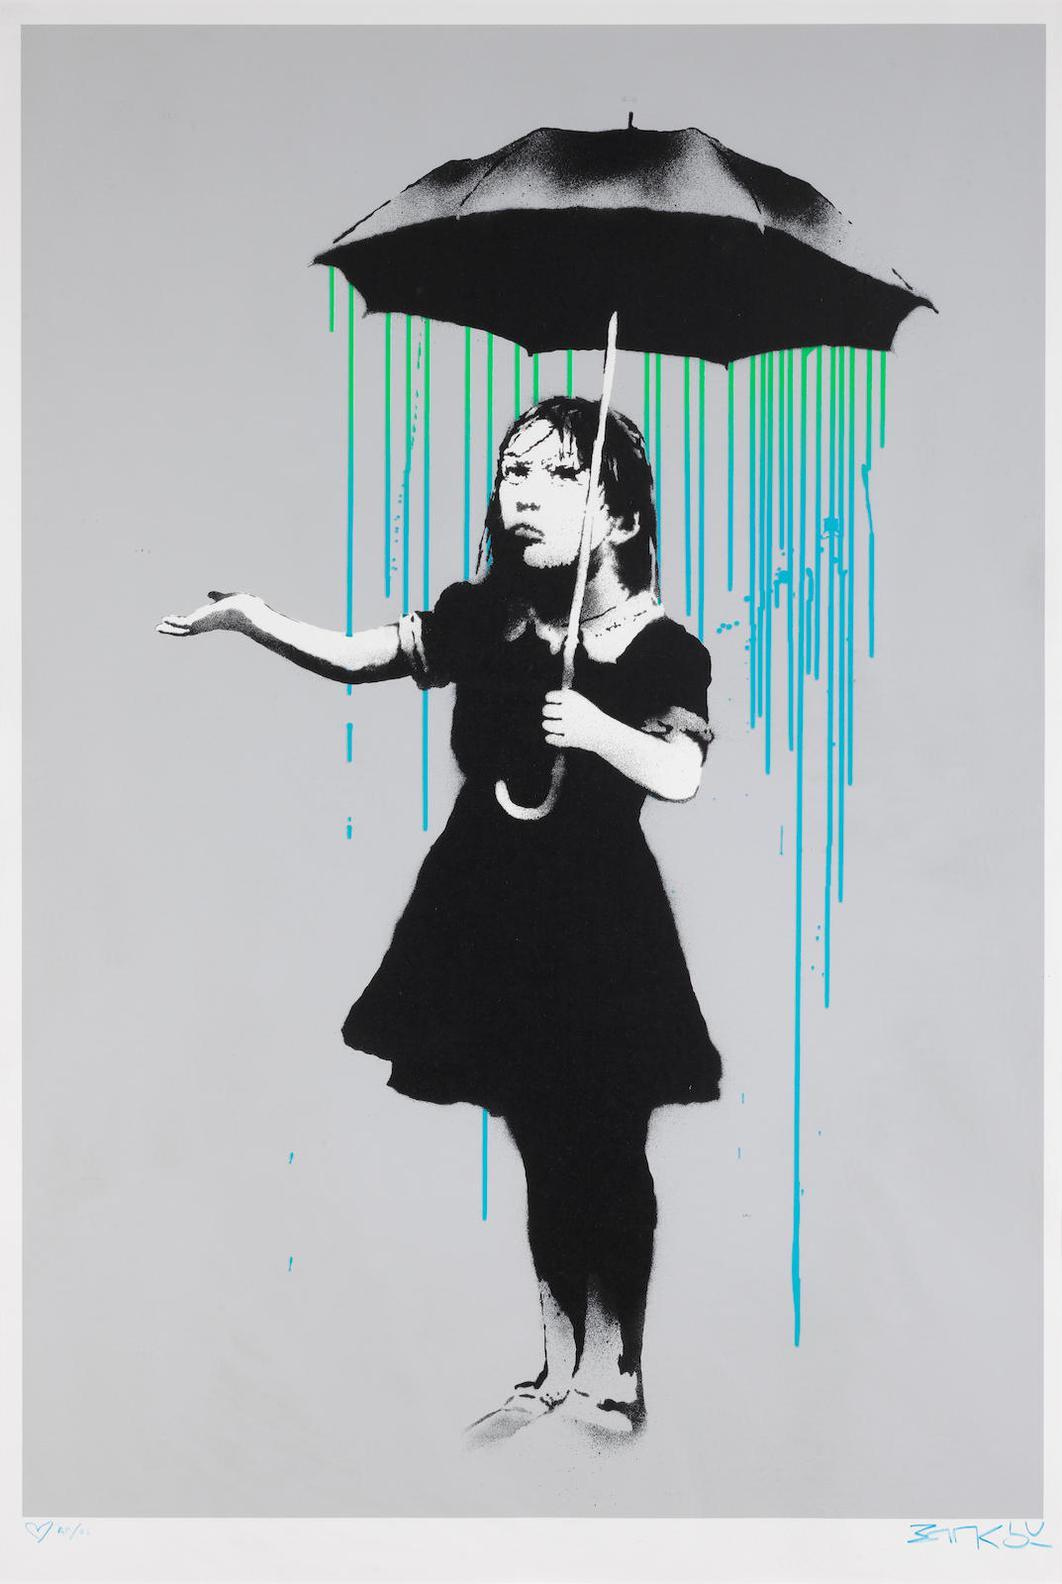 Banksy-Nola (Blue And Green Rain)-2008